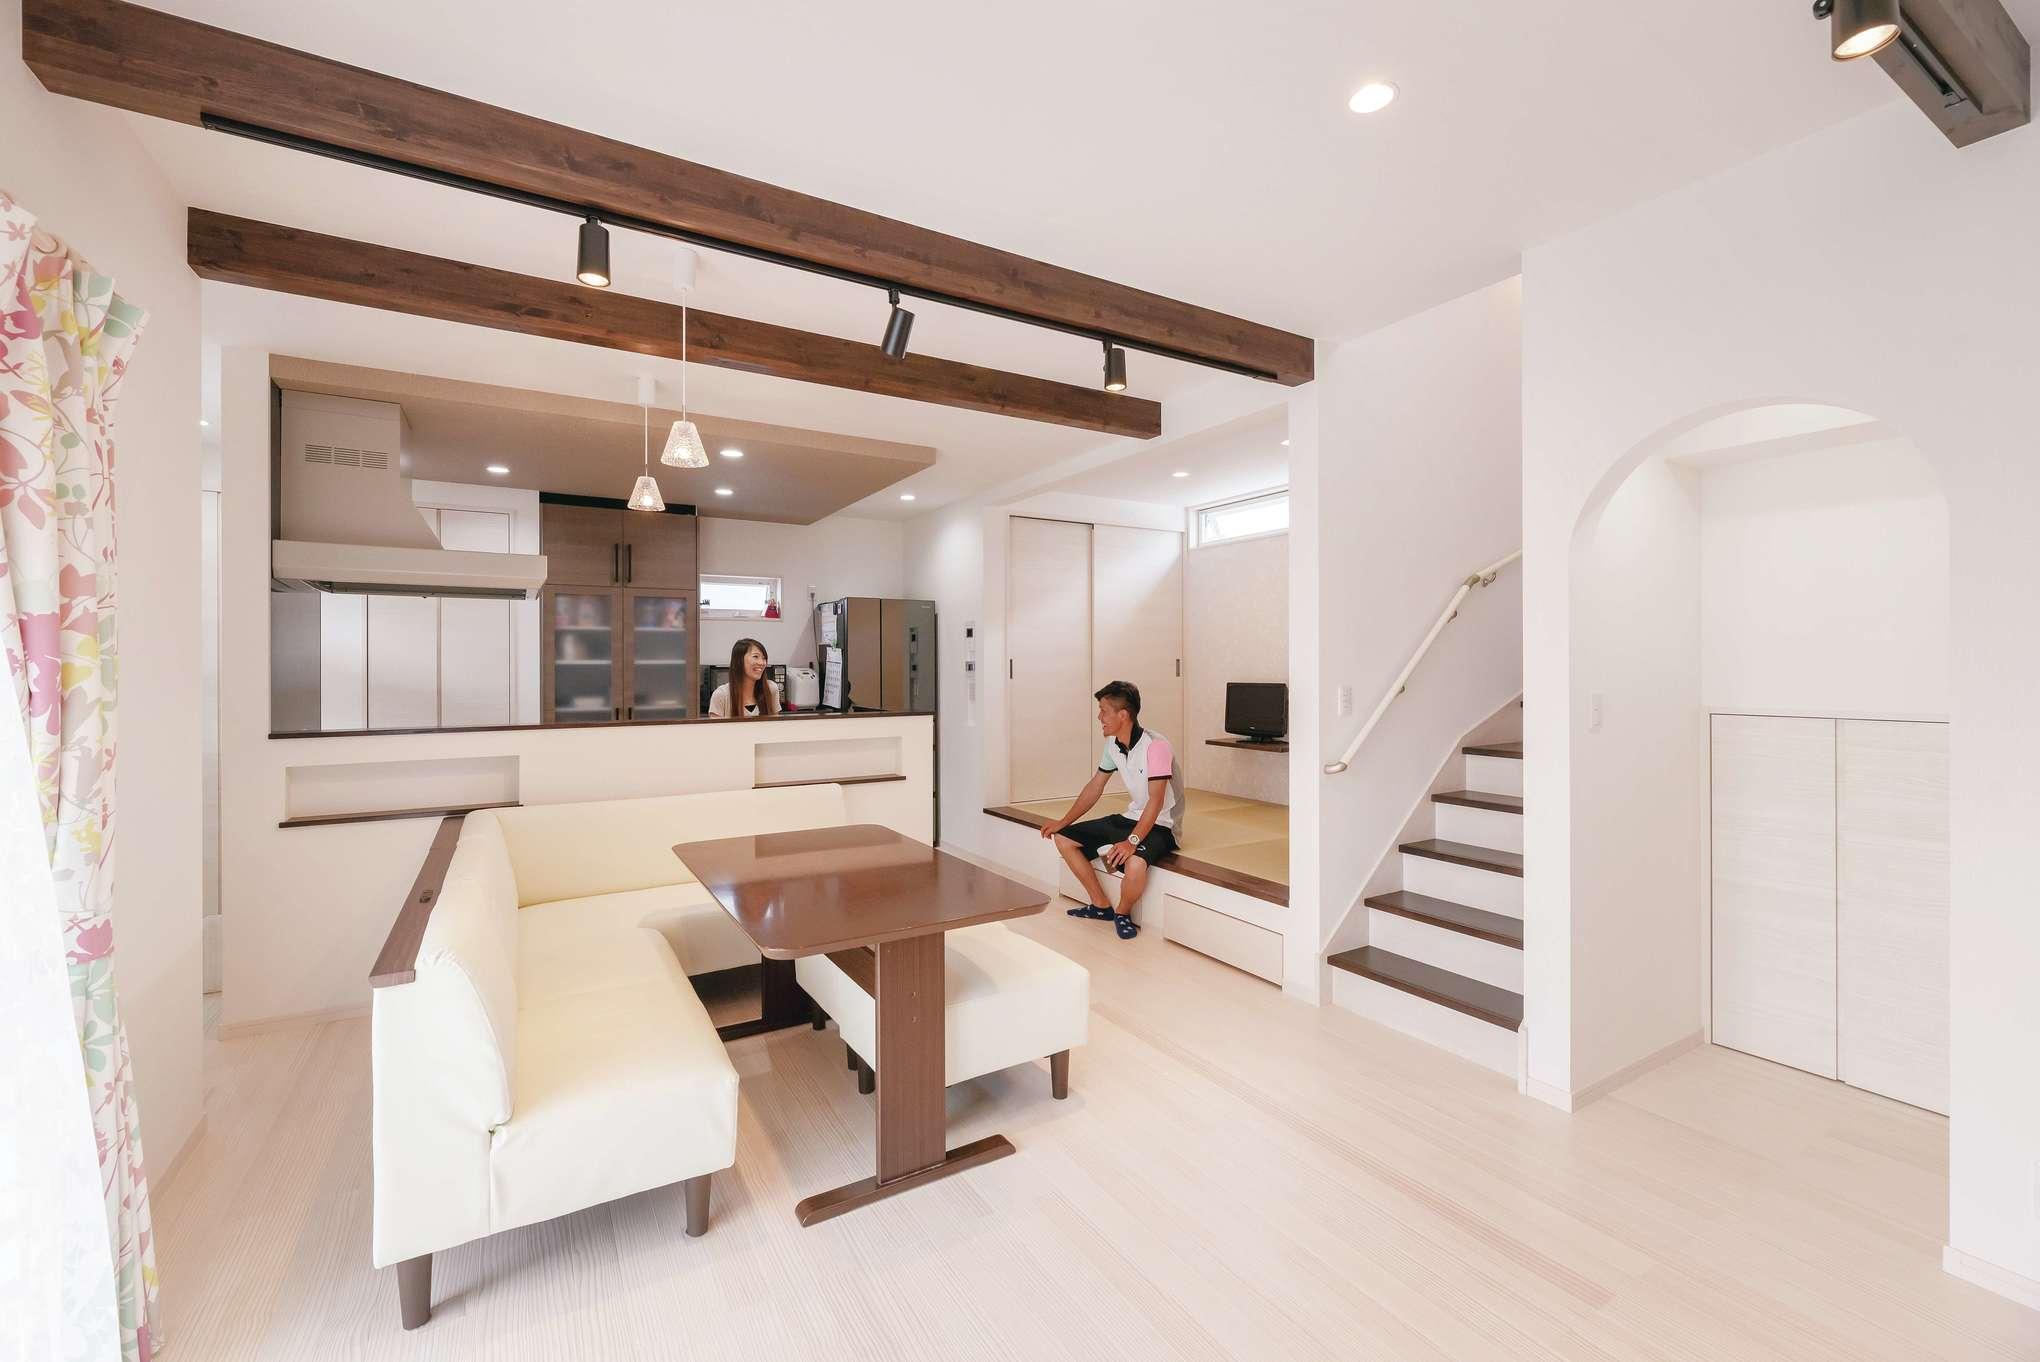 R+house沼津・伊東(HOUSE PLAN)【子育て、収納力、間取り】高さ38cmの小上がりは、腰を掛けるのに最適な高さ。キッチンのダウンライトはスピーカー付きをチョイス